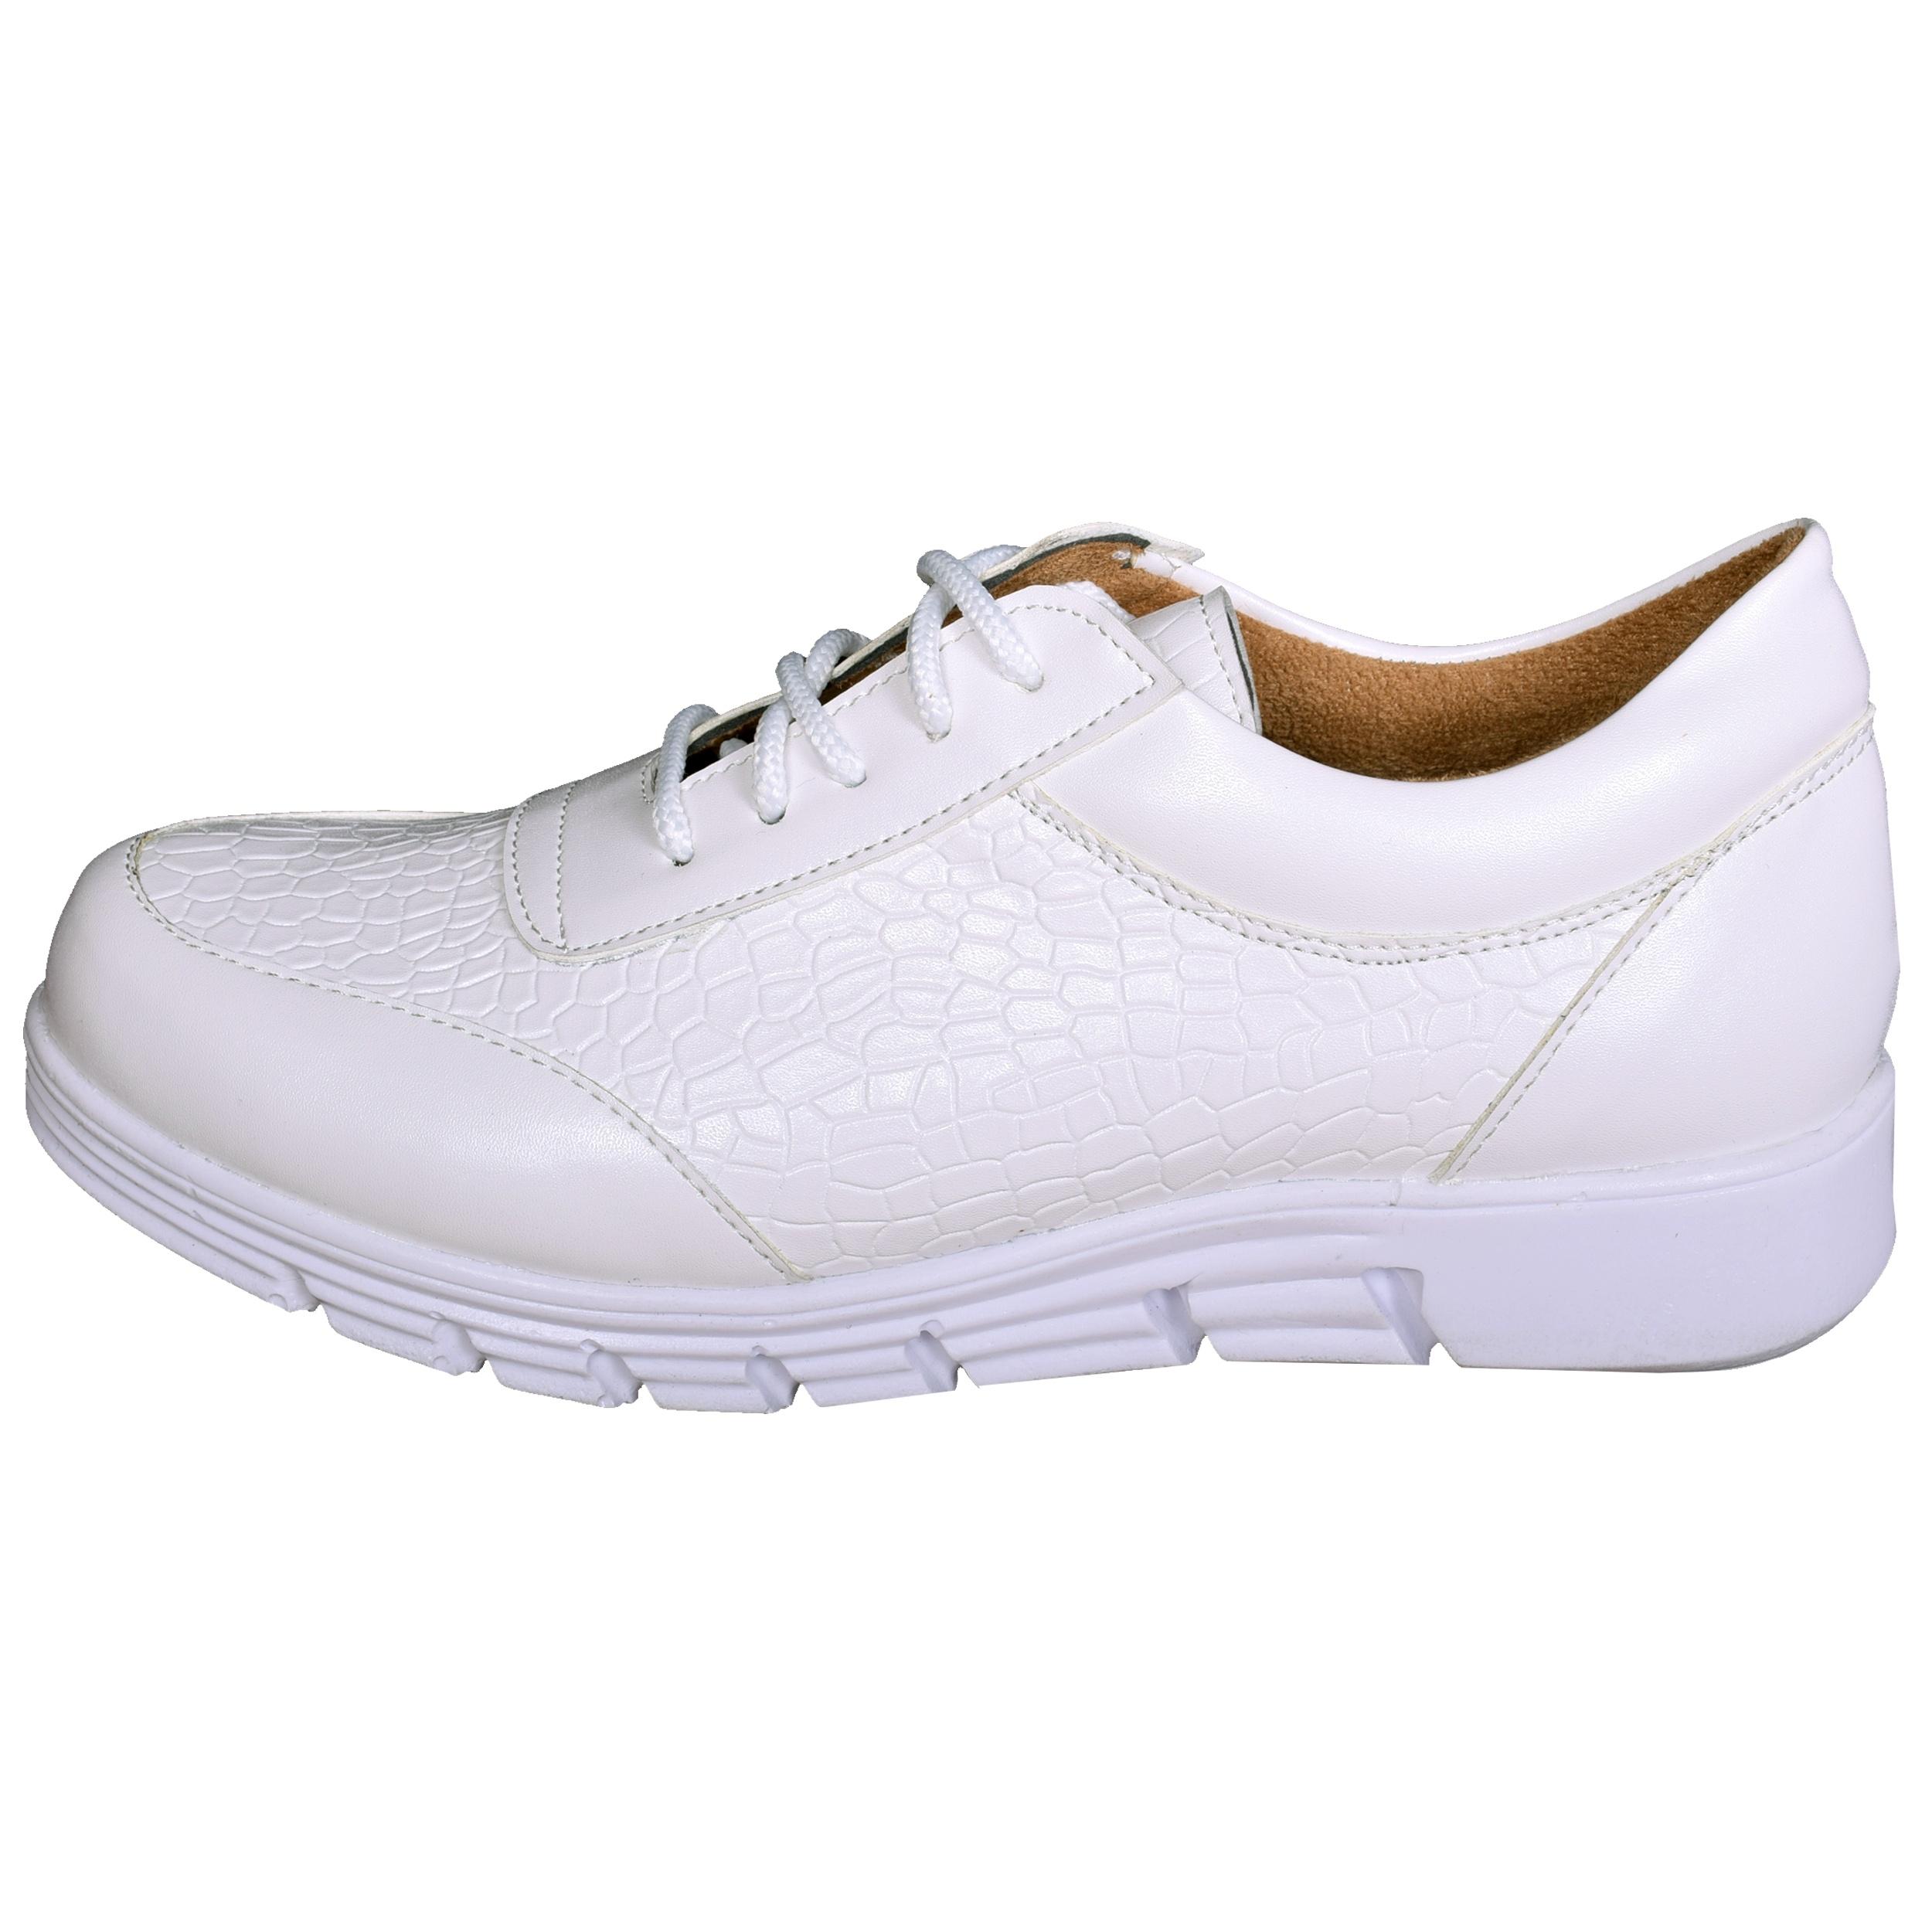 کفش راحتی زنانه کد WH-2716